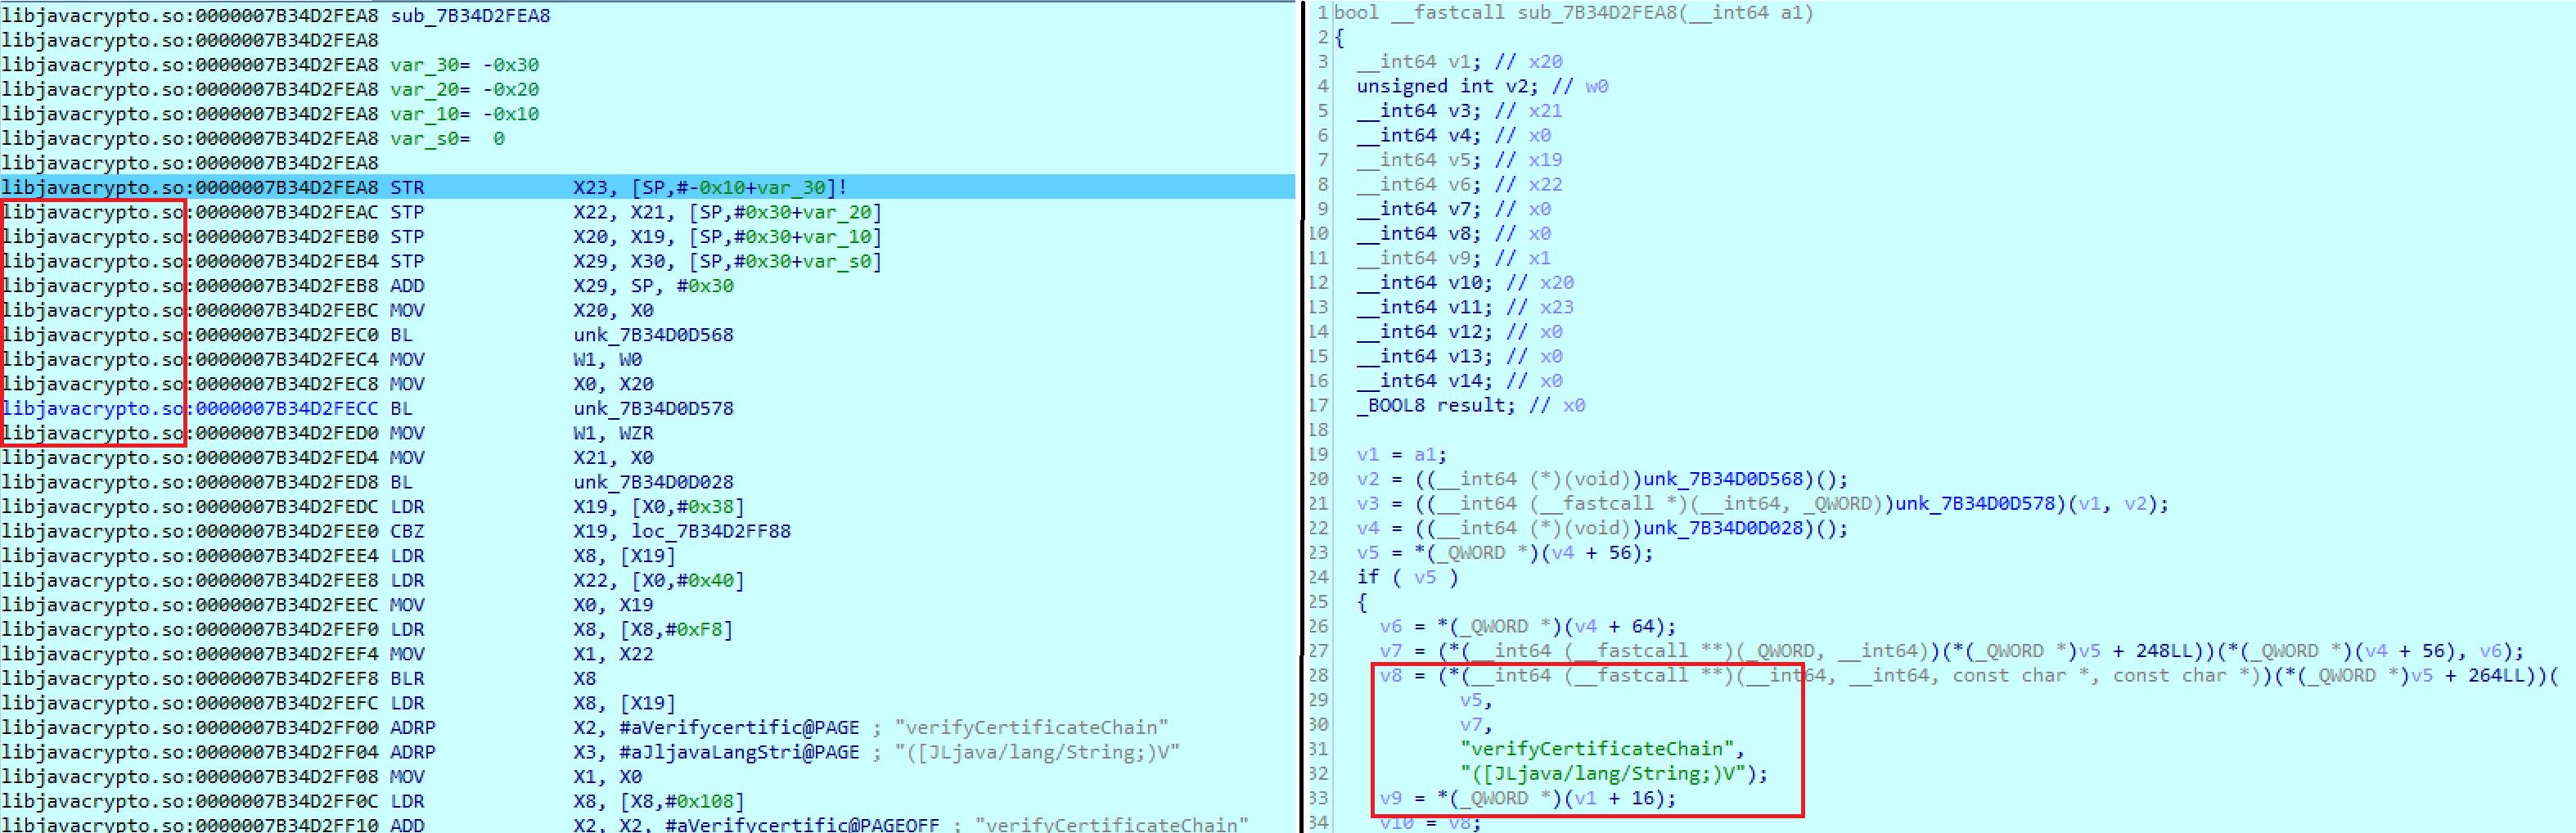 Callback в Android, получающий управление при проверке сертификата сервера